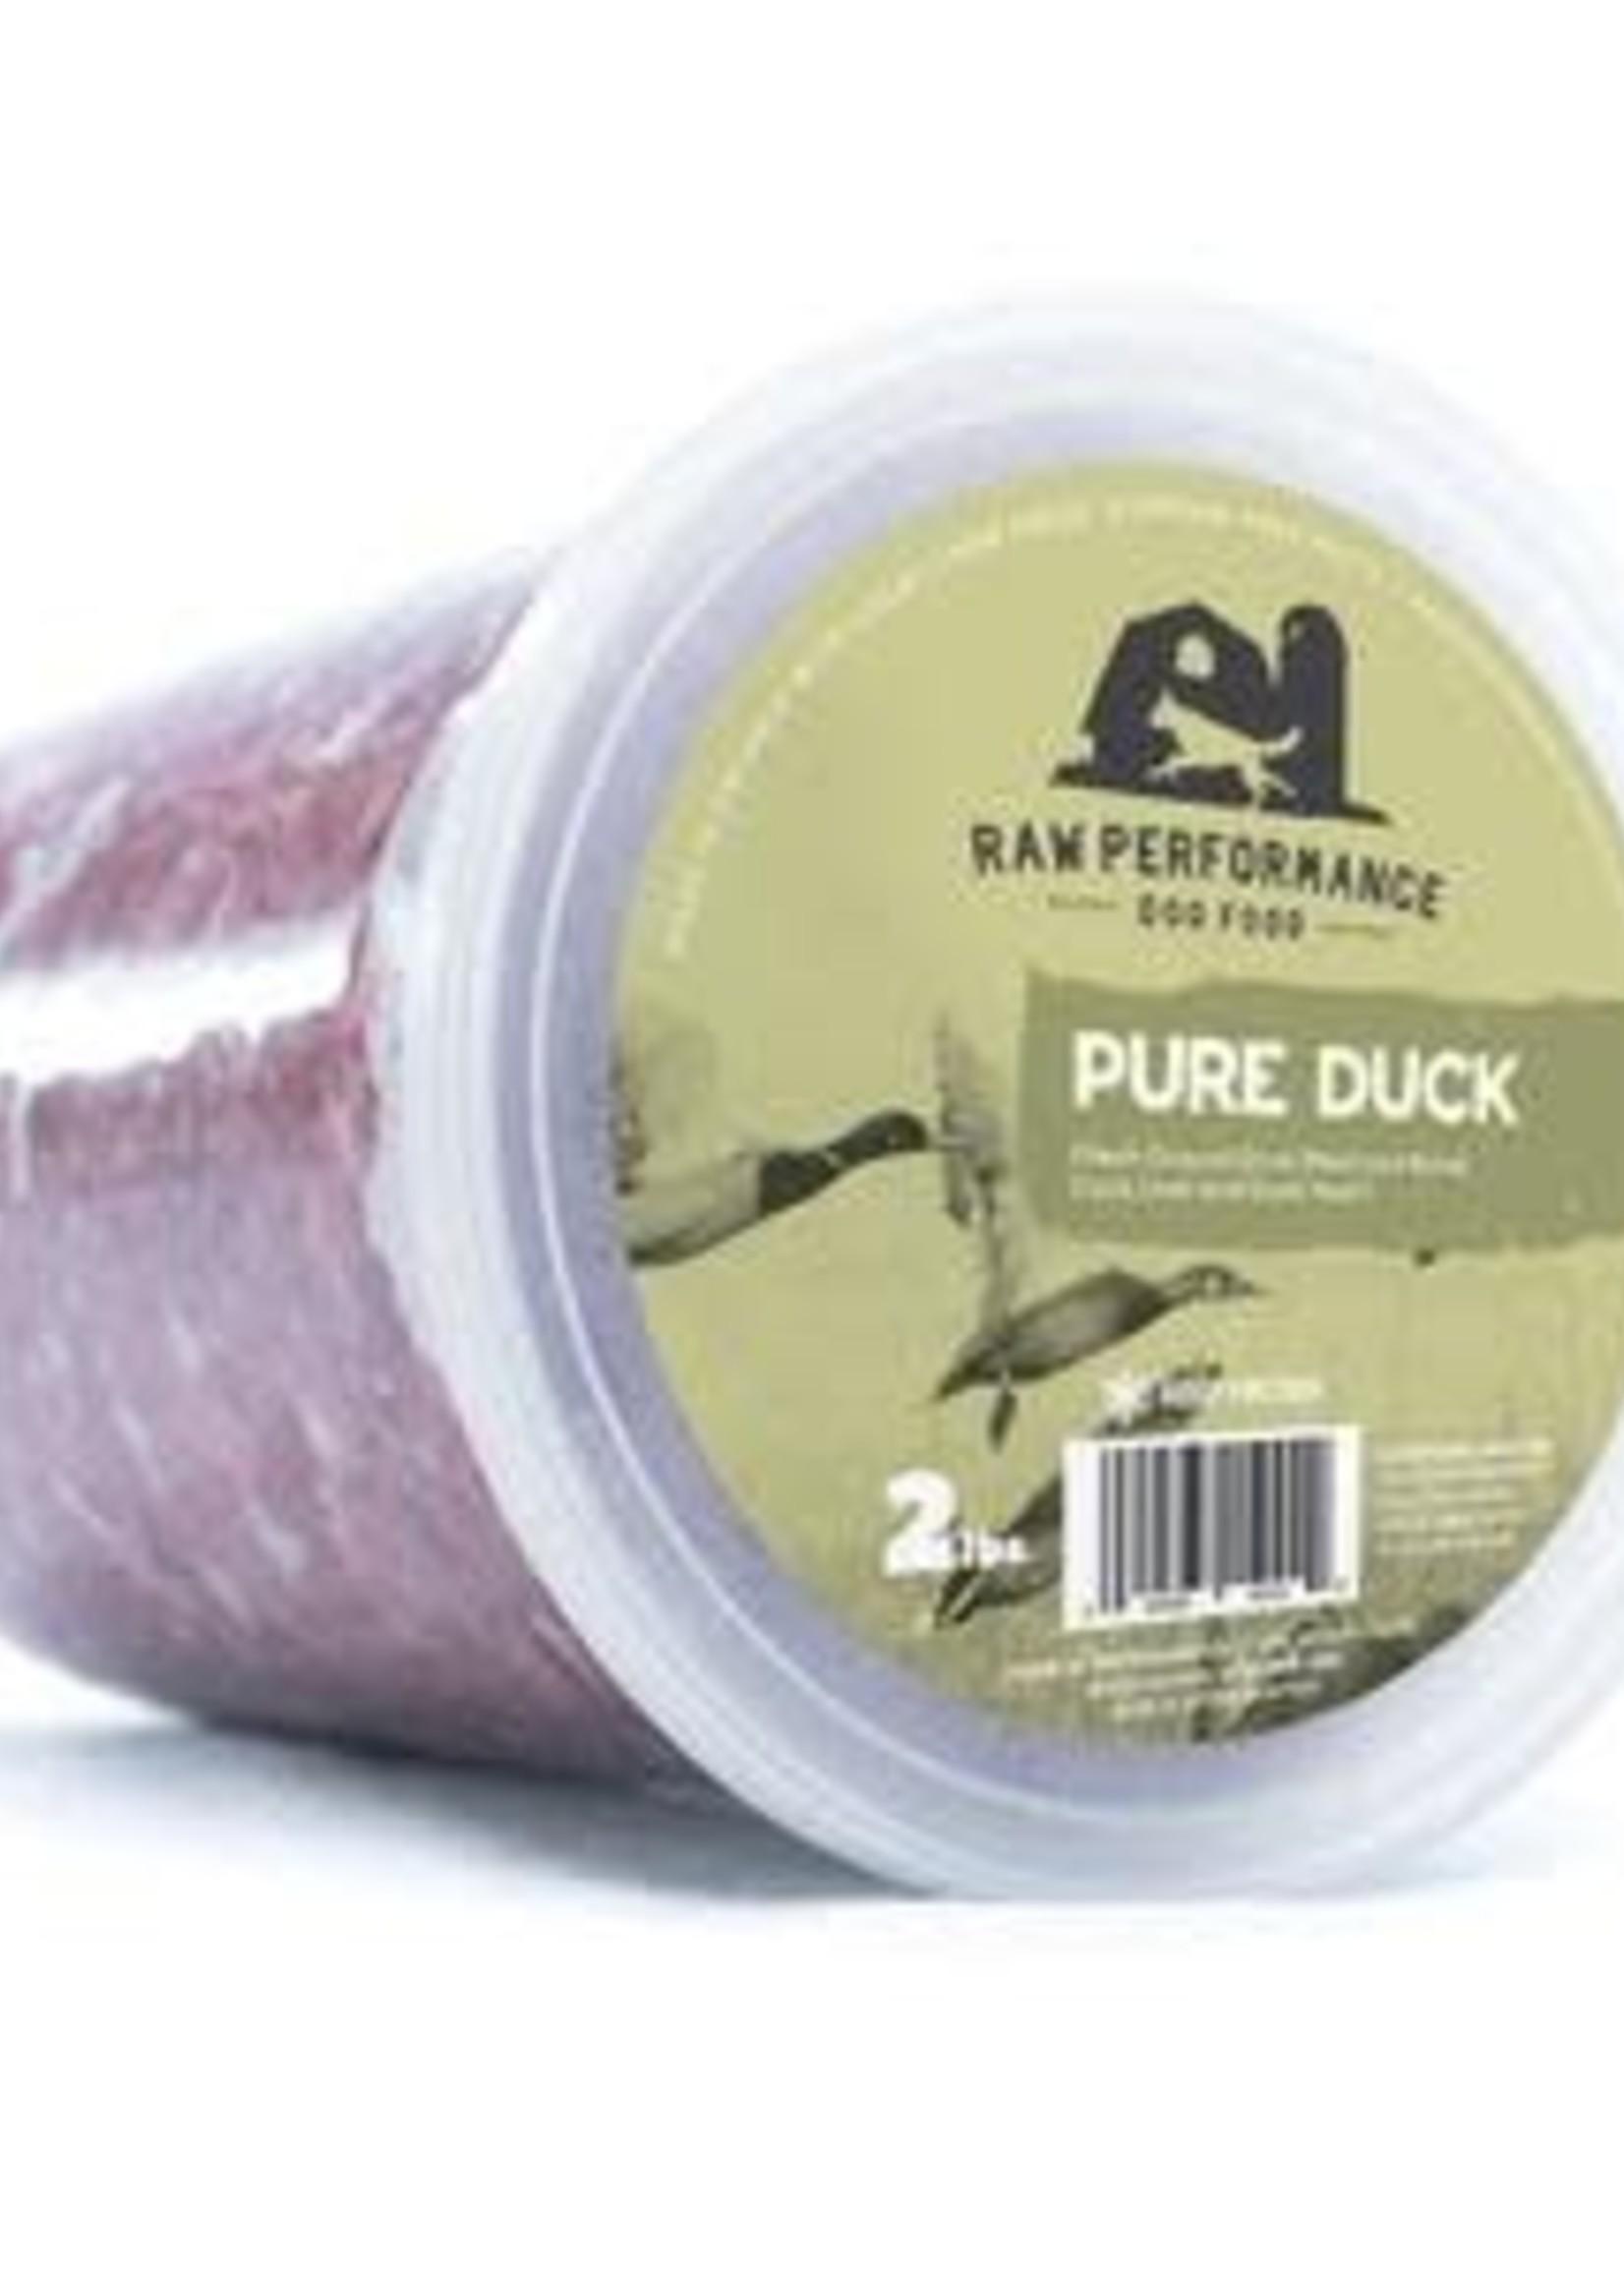 Raw Performance Raw Performance Pure Duck 2lb